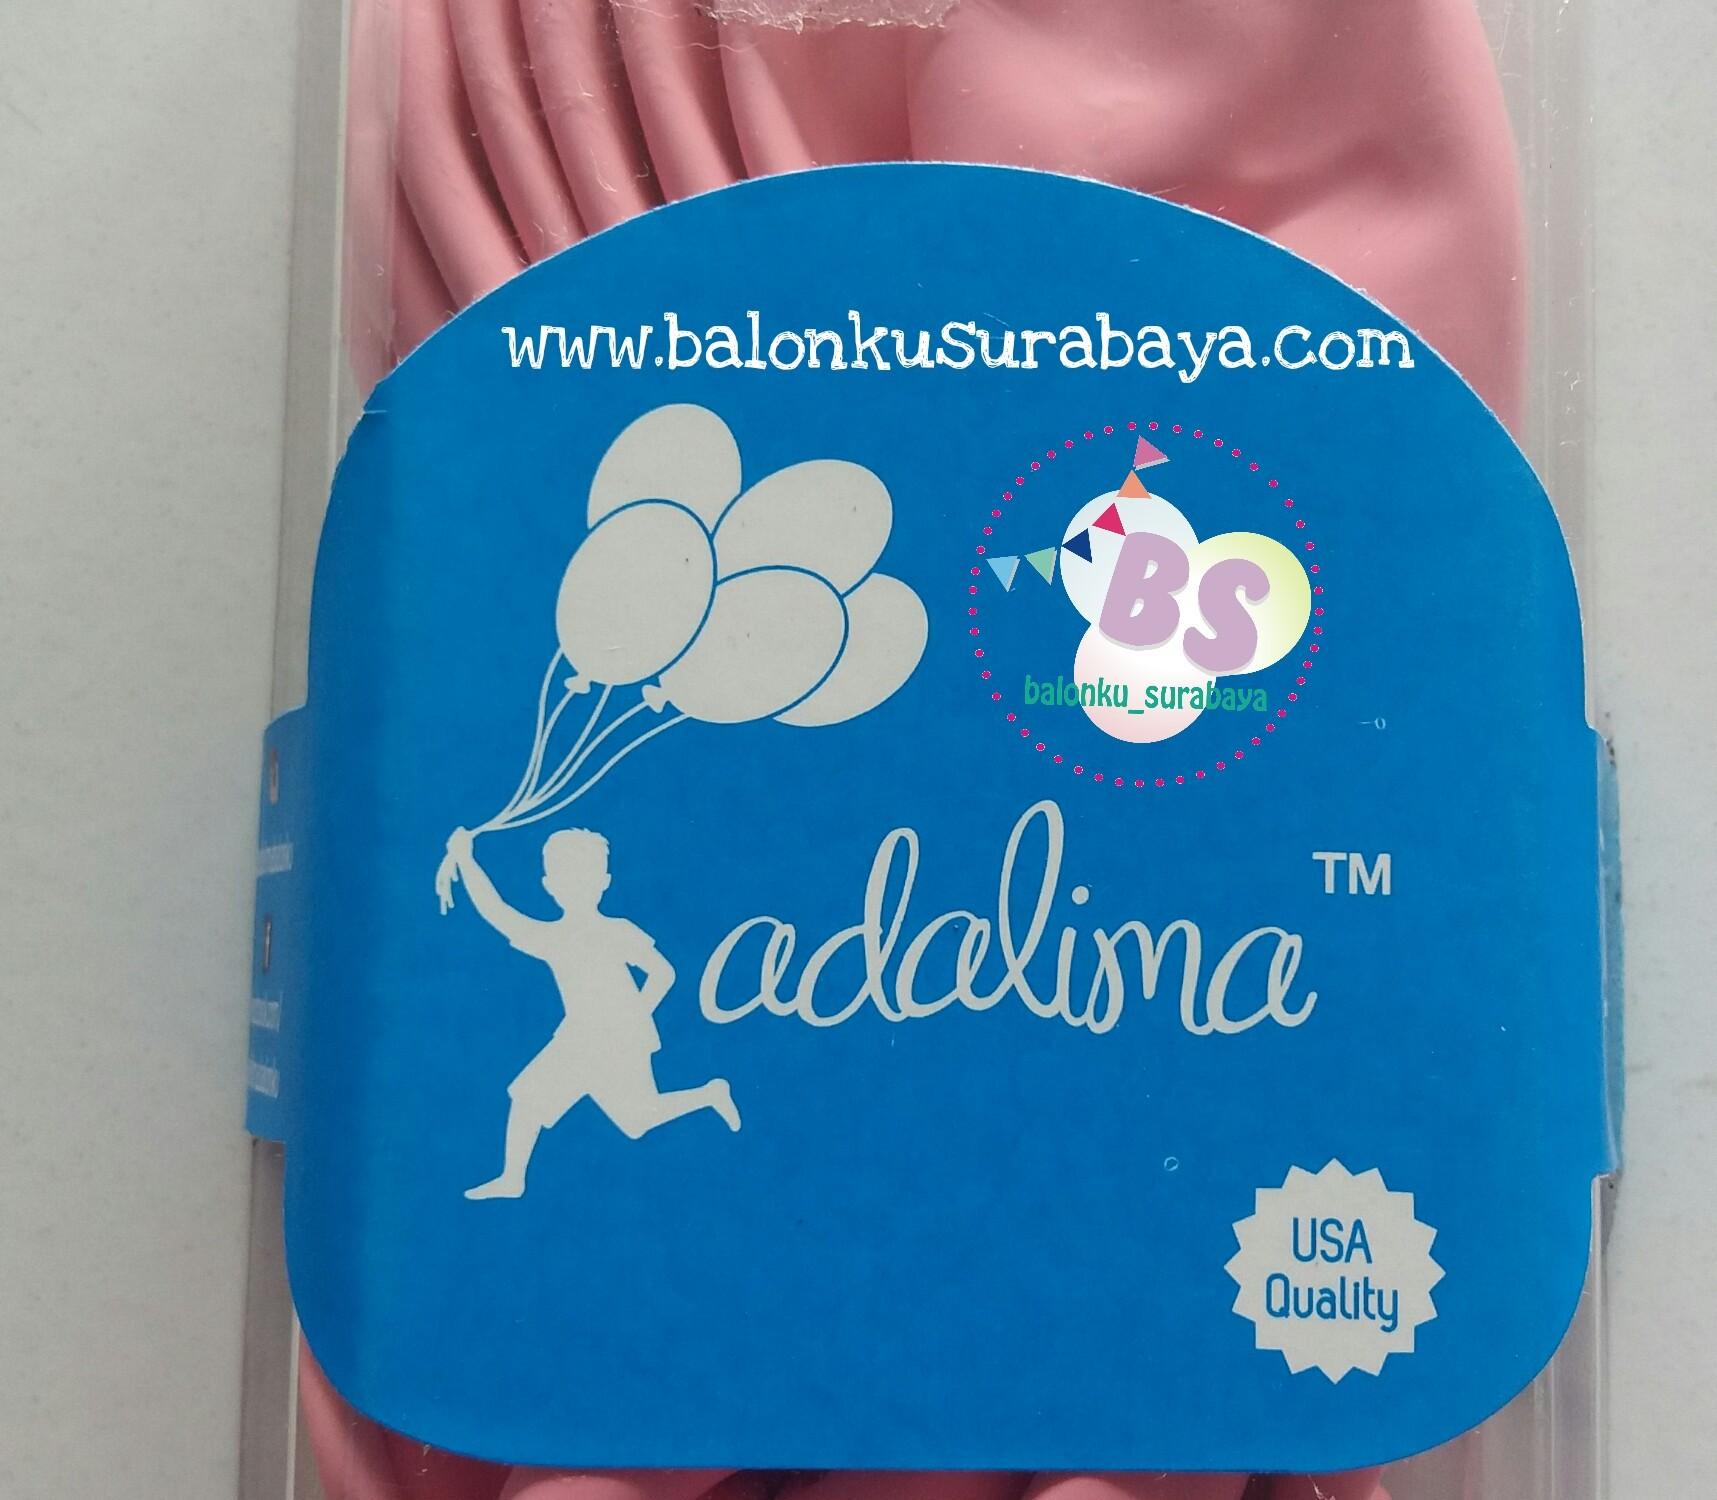 balon latex adalima pink, balon doff, balon metalik